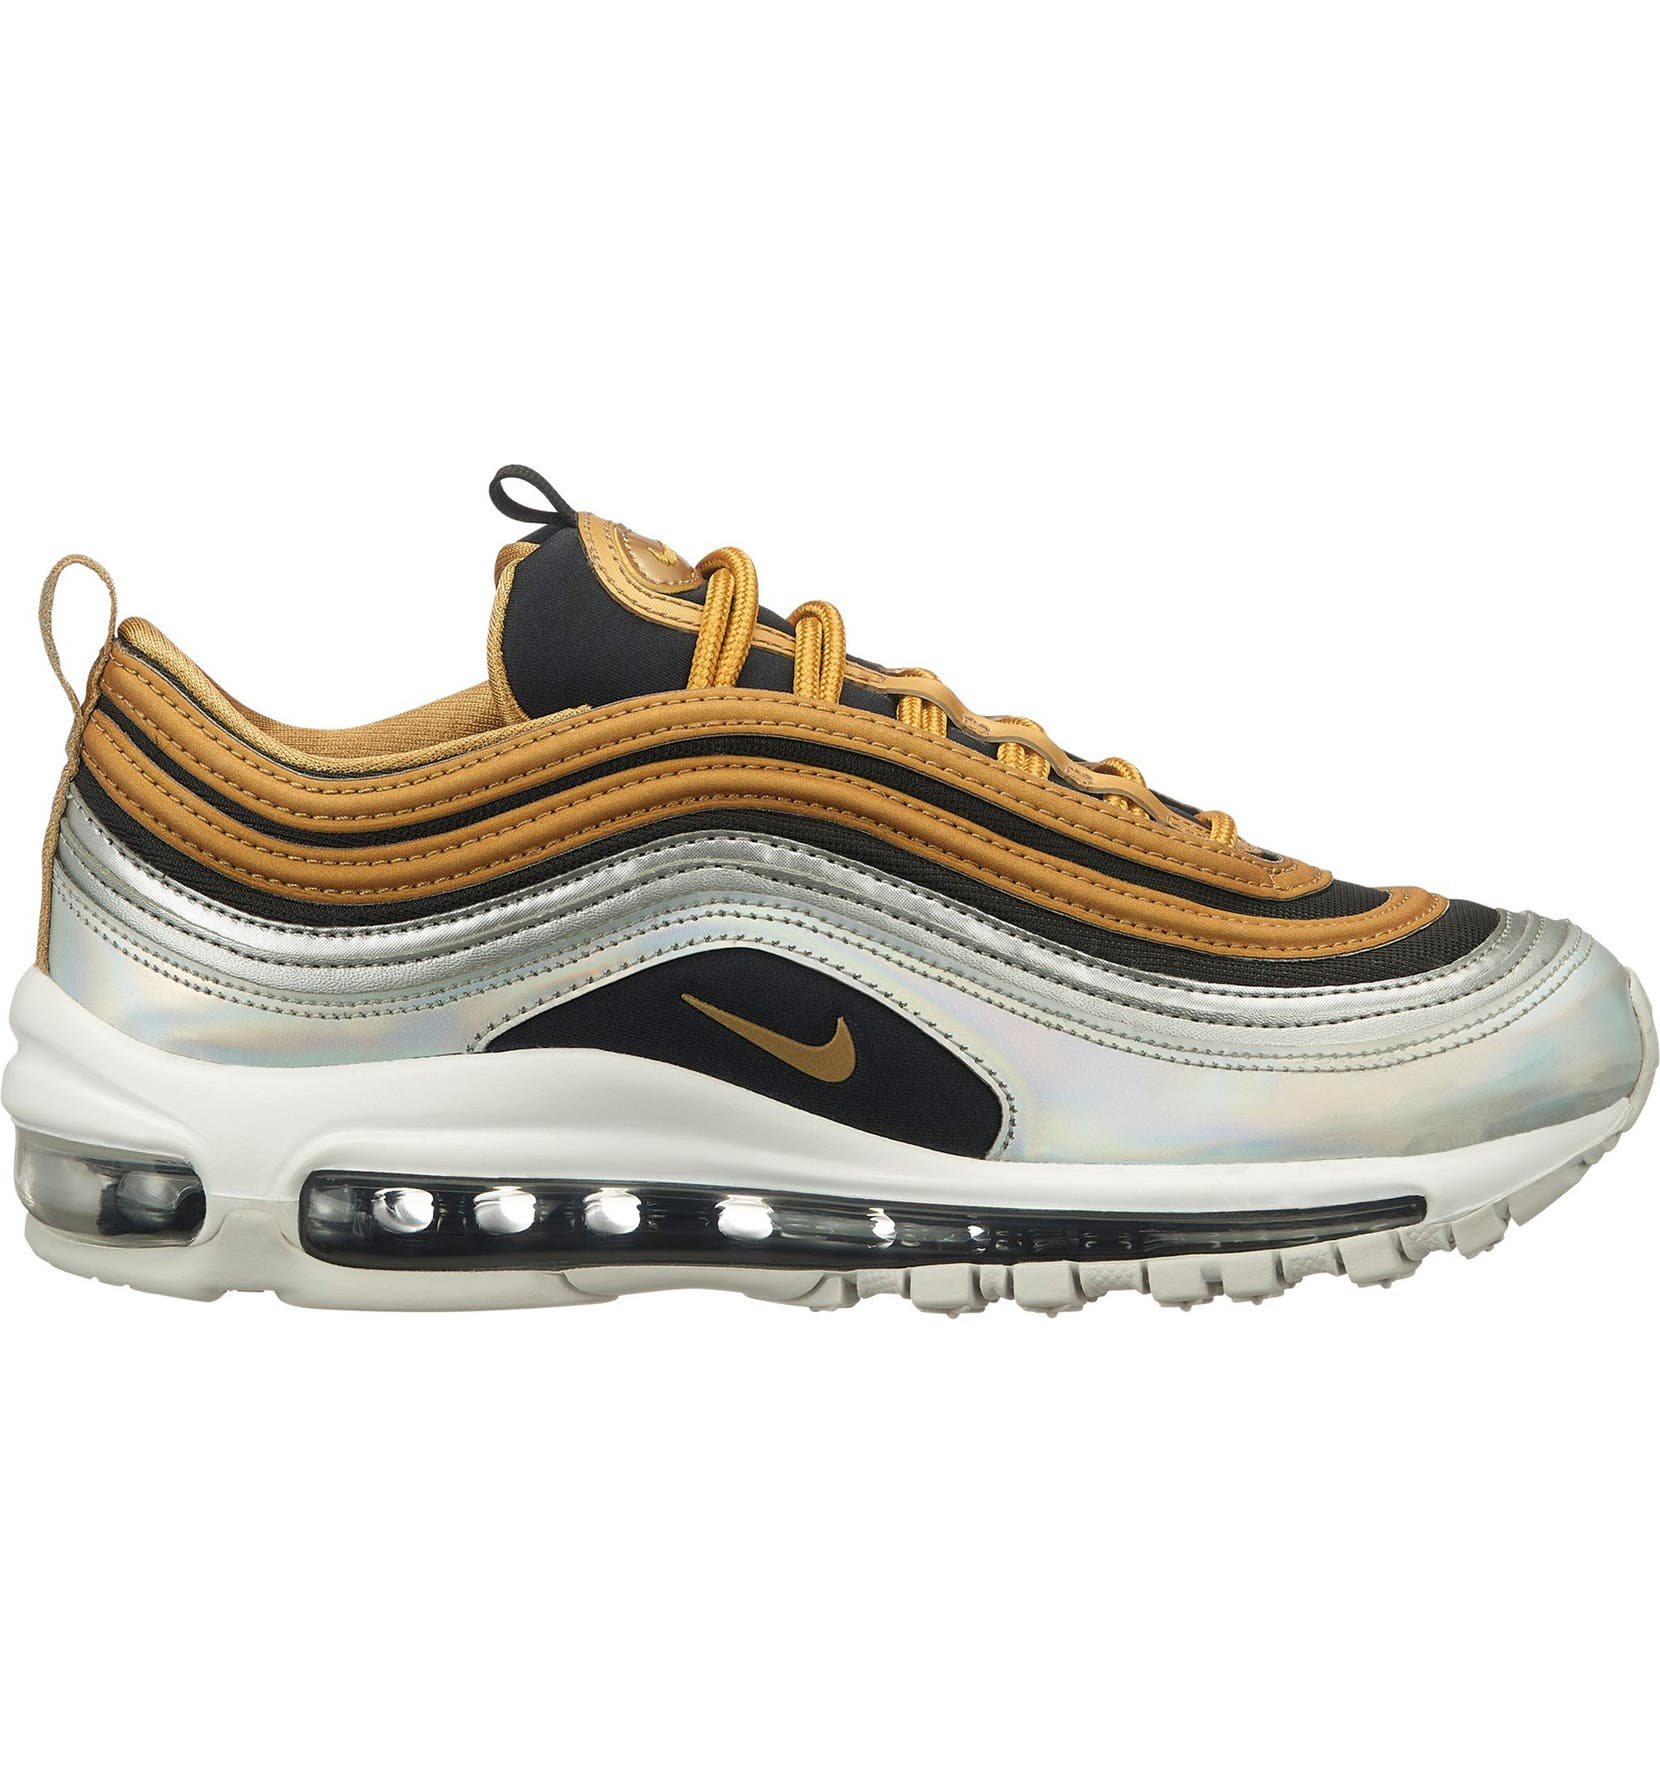 Nike Air Max 97 SE Sneaker (Women)  99a05b633